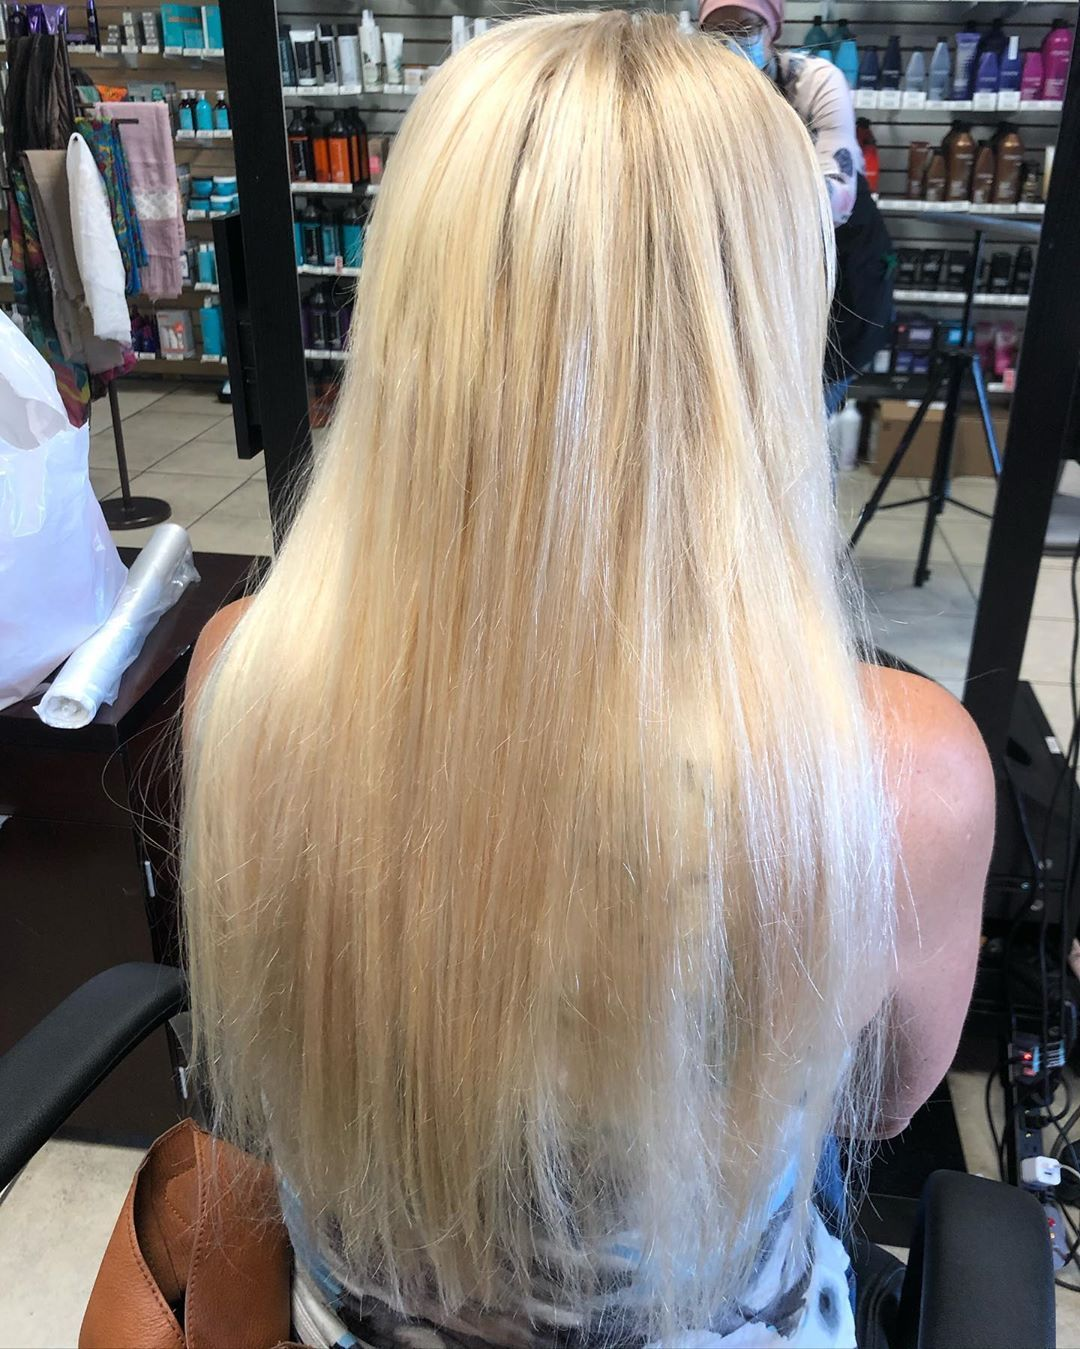 Tumblr In 2020 Fusion Hair Extensions Long Hair Styles Hair Styles